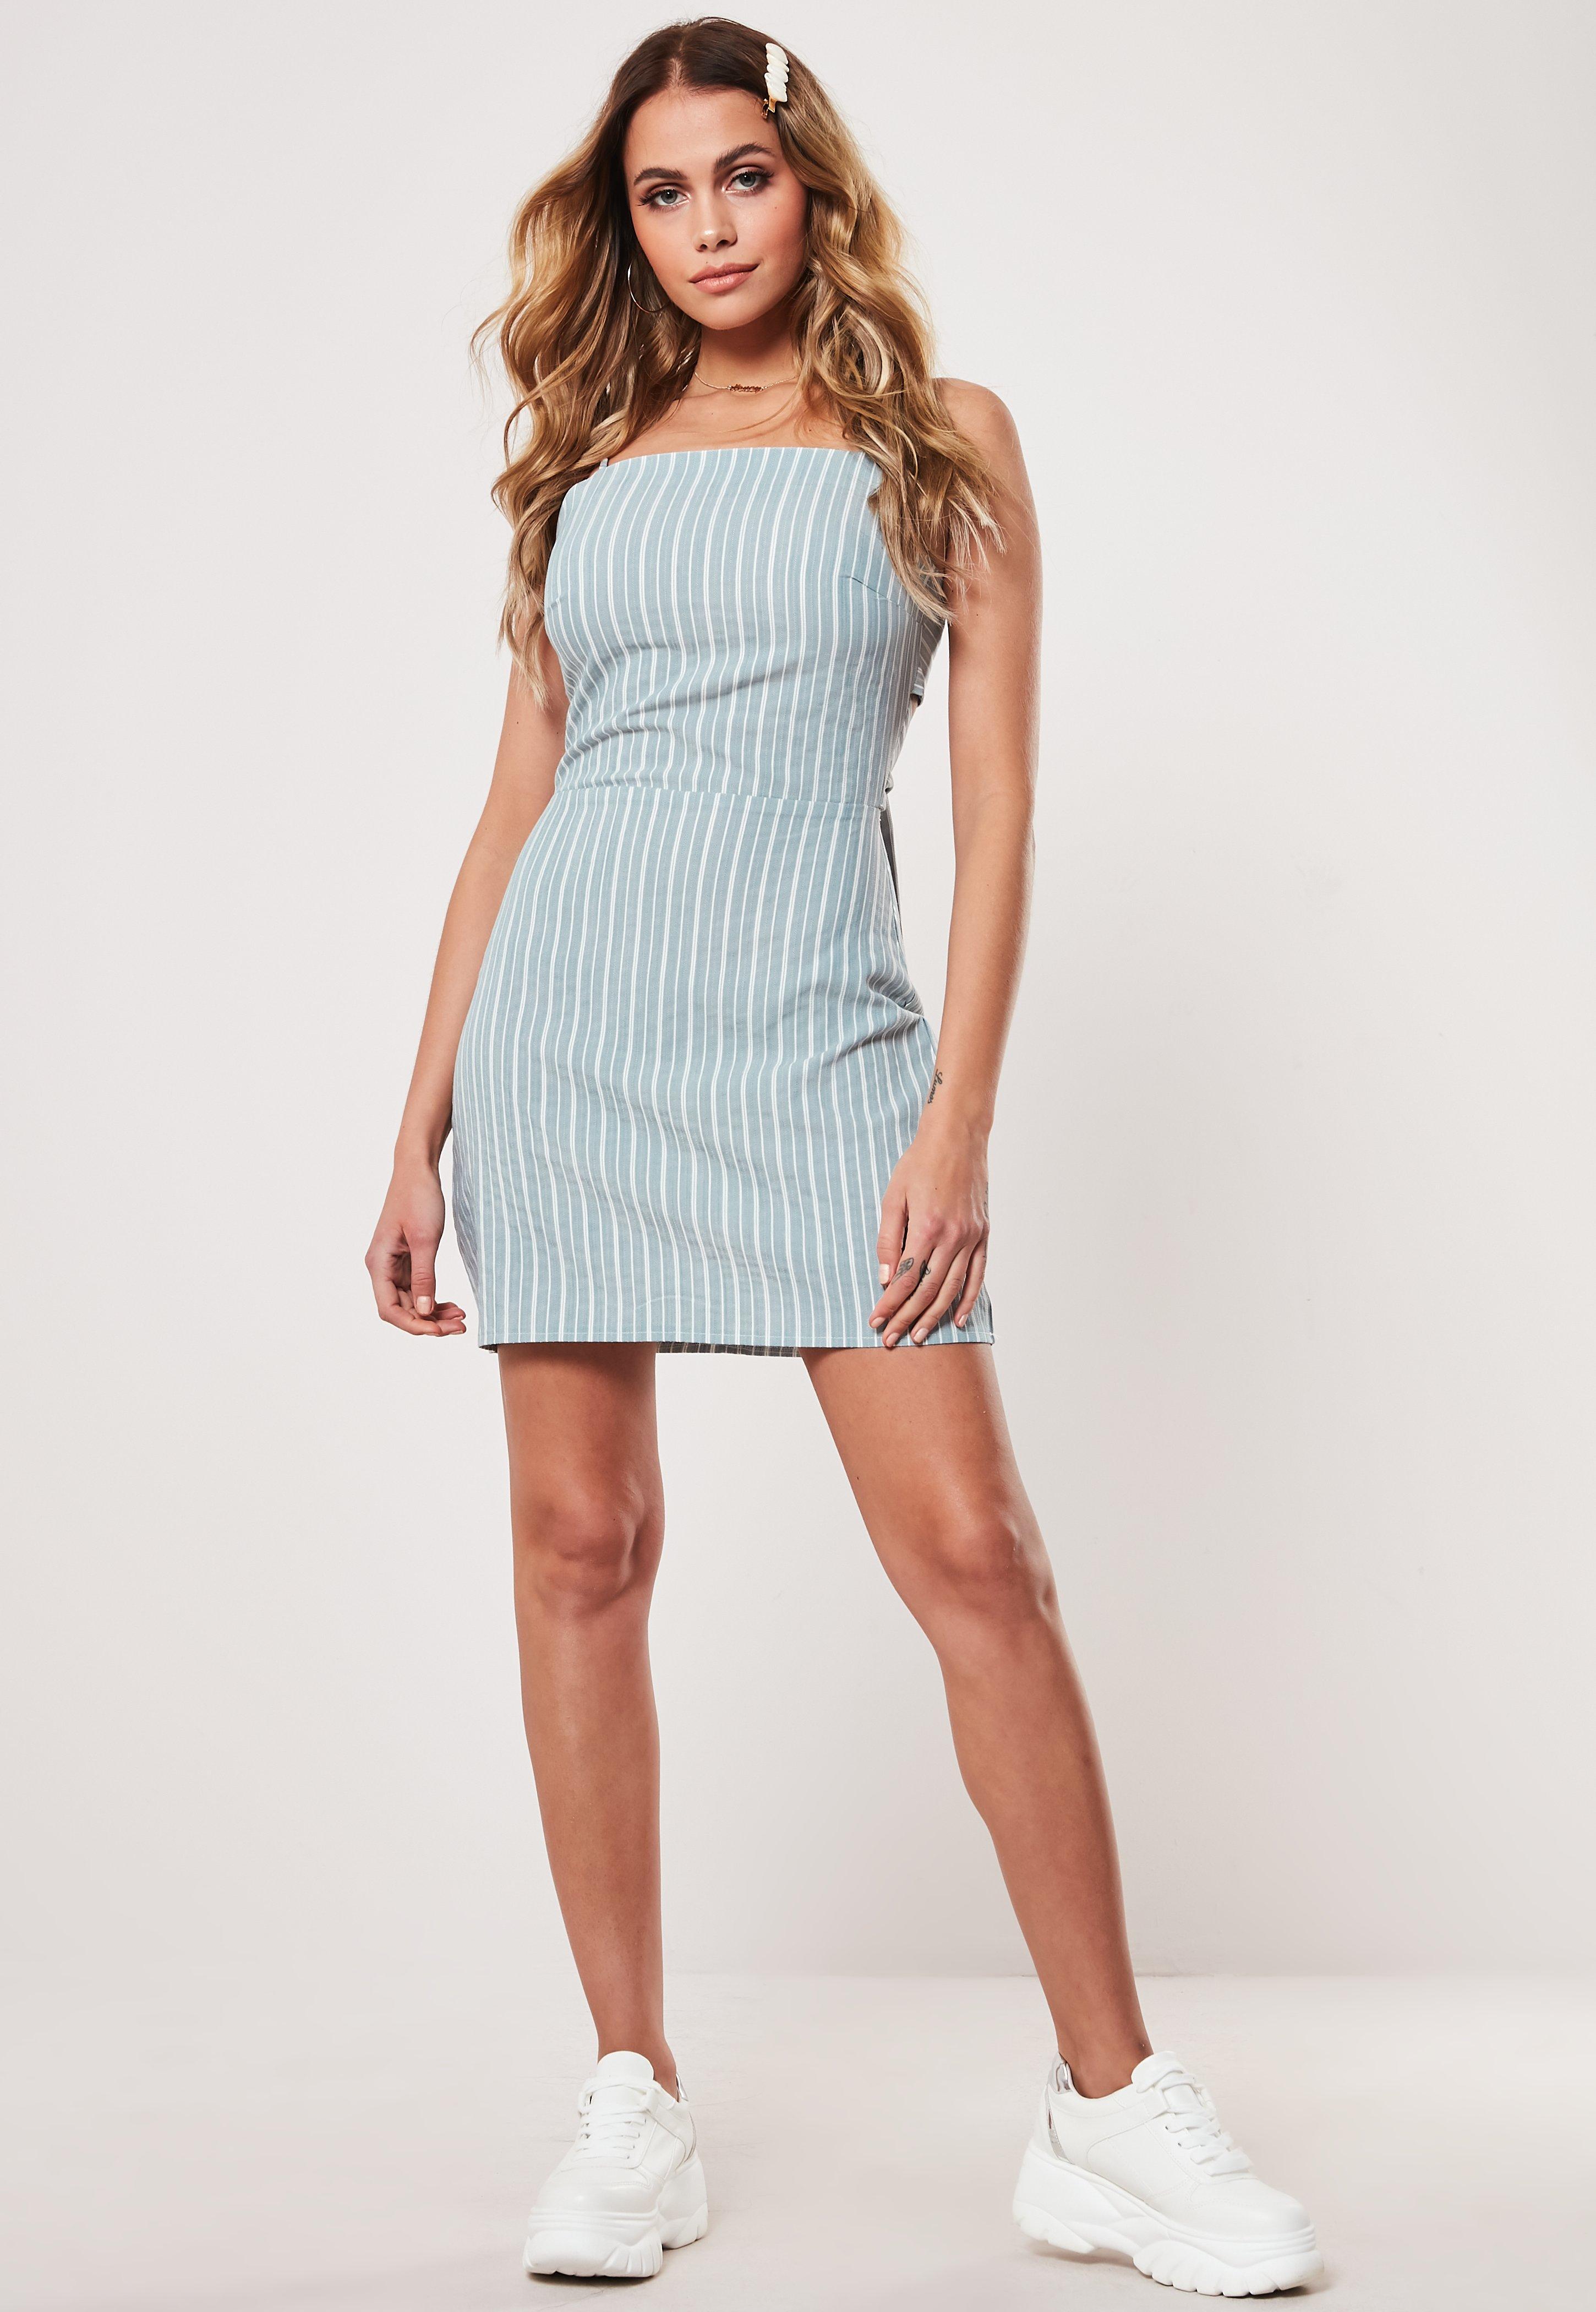 747bf20d5c Dresses UK | Women's Dresses Online | Missguided